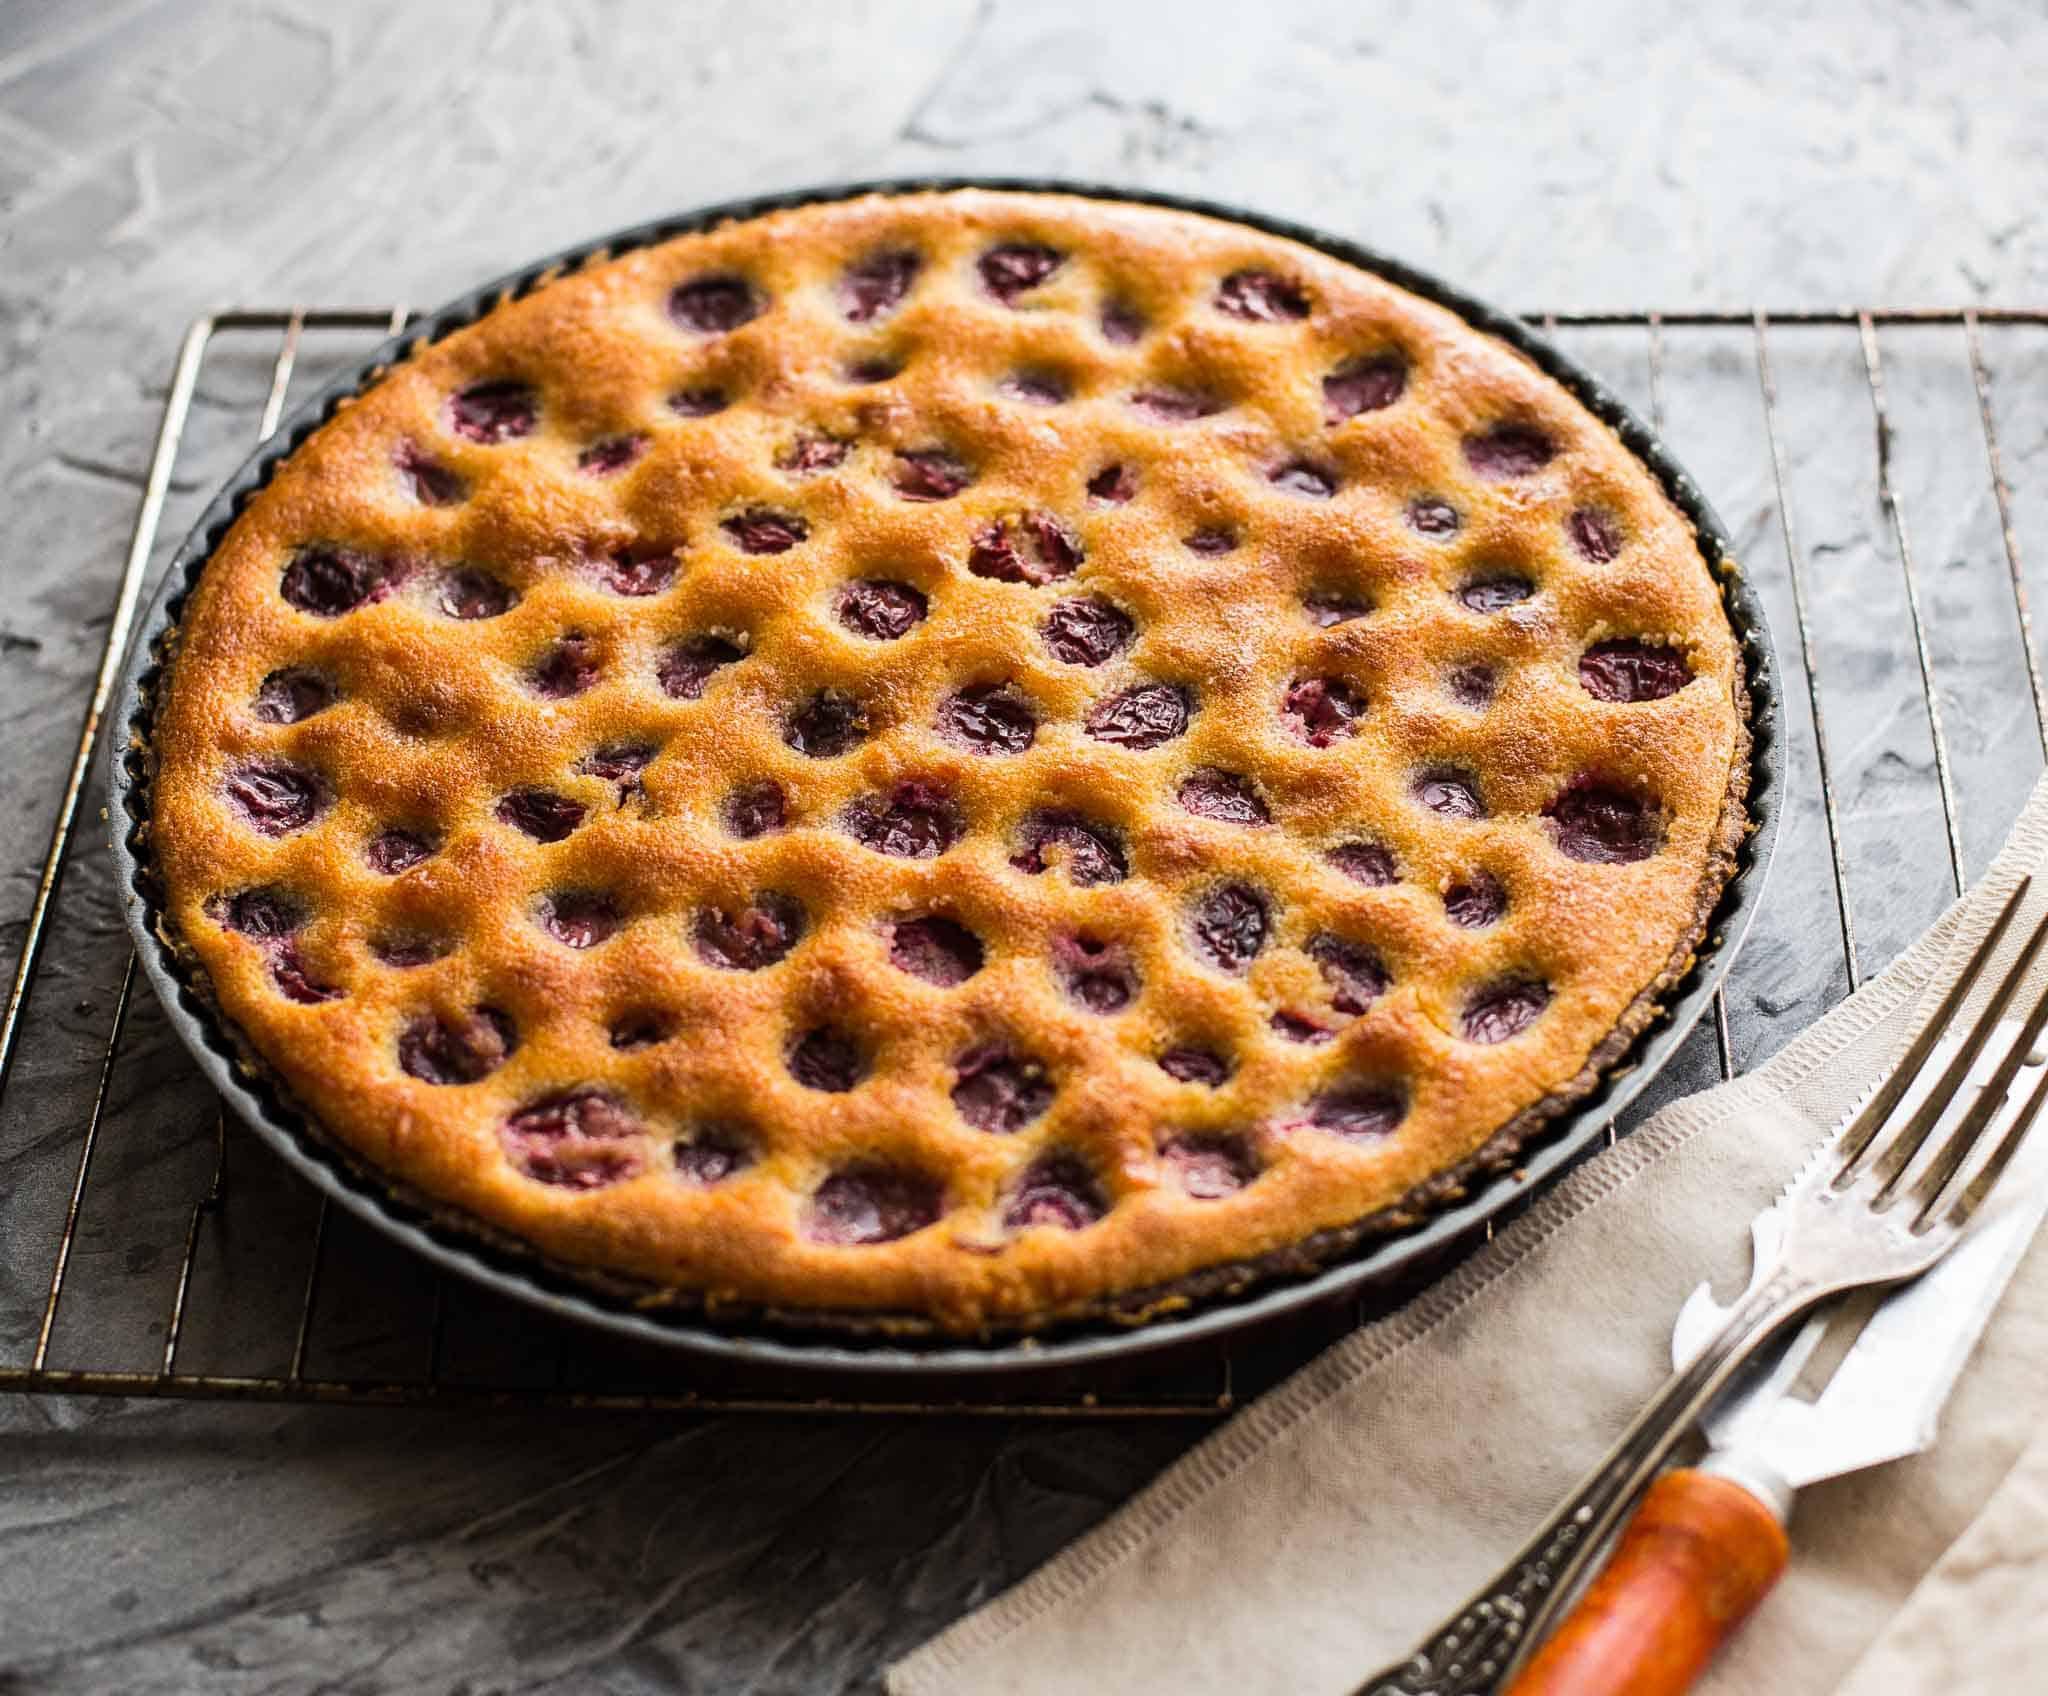 Freshly baked cherry and almonds tart